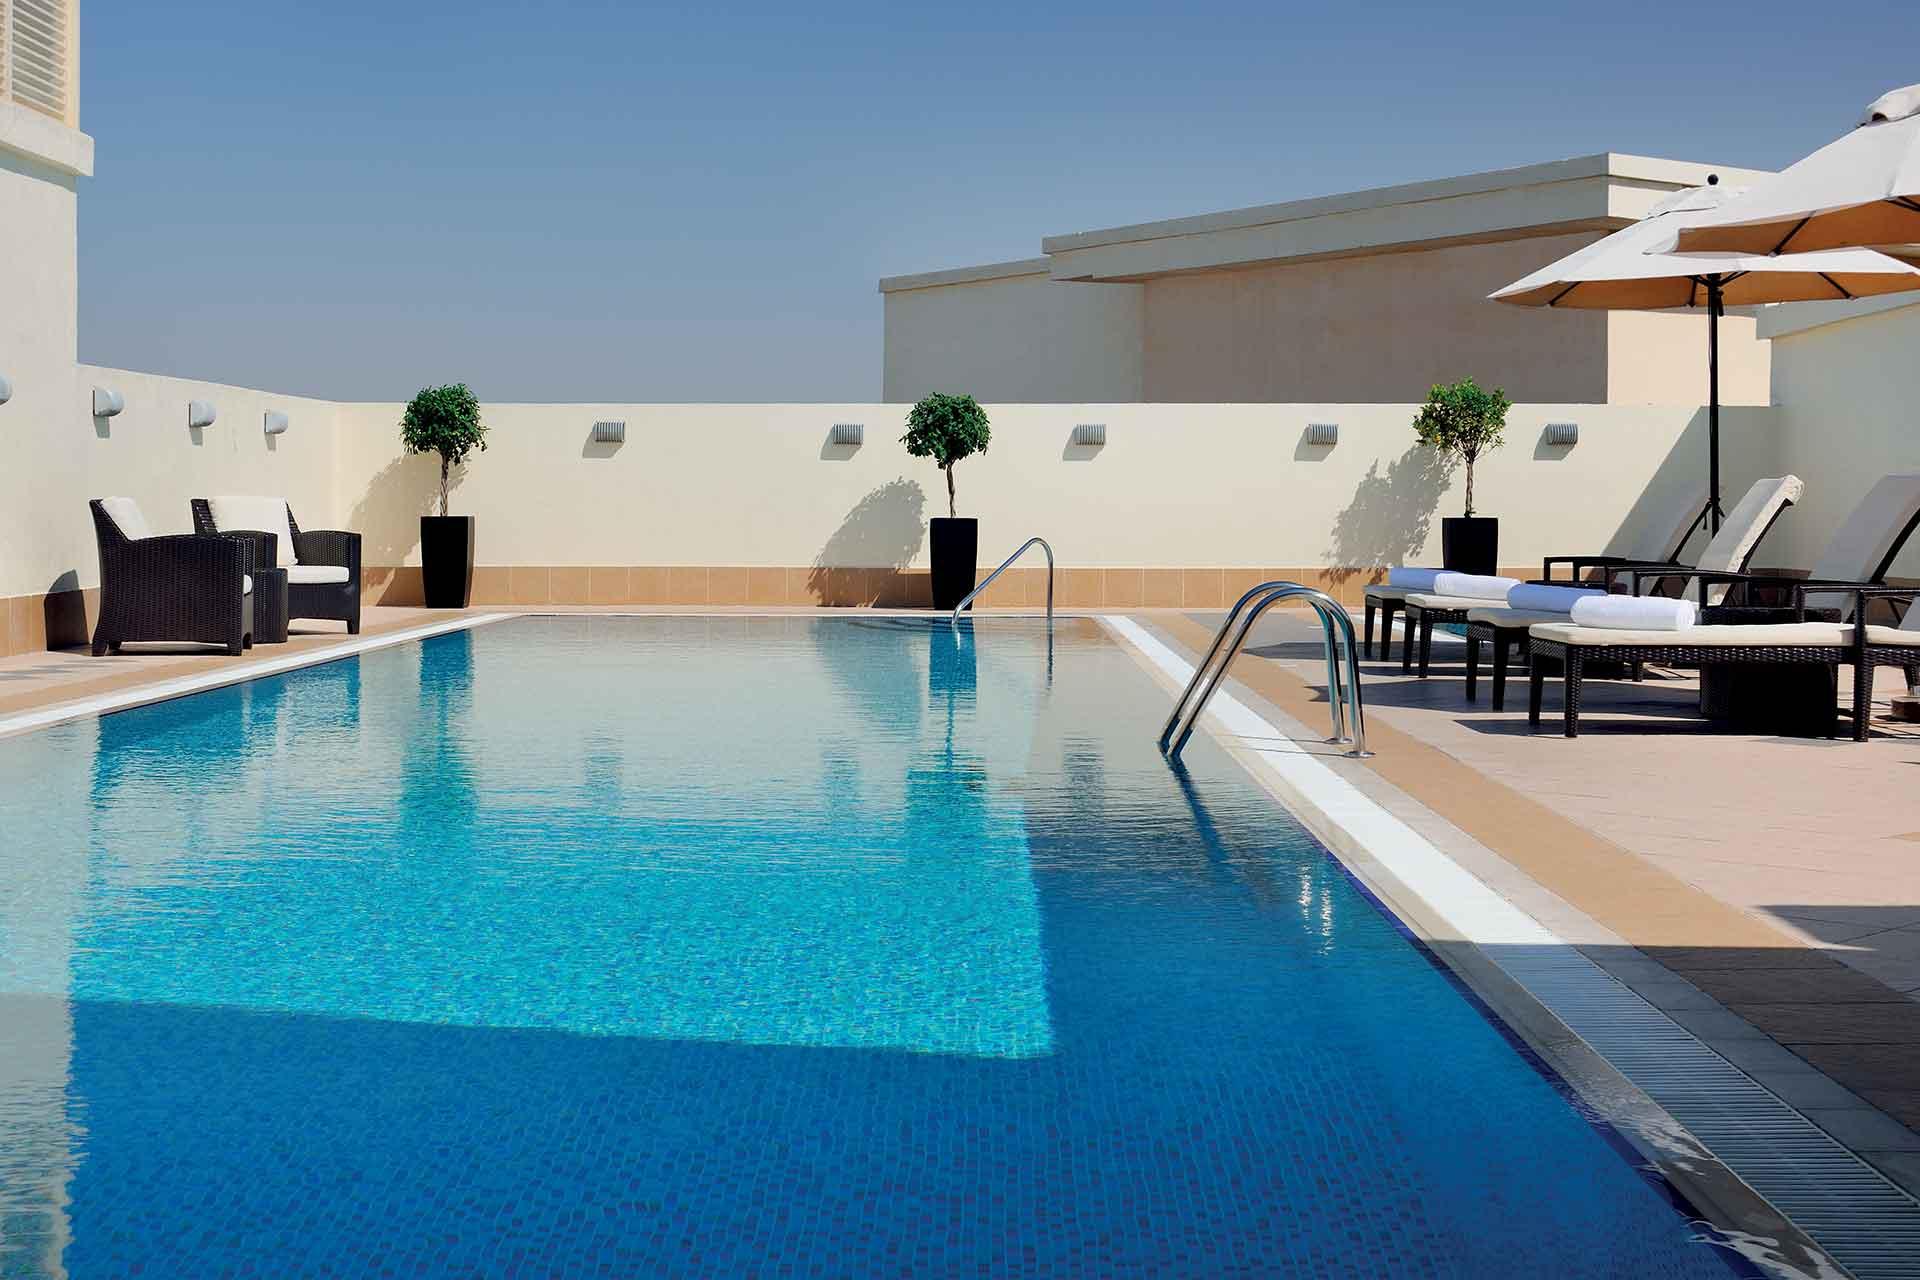 AVANI Deira Dubai rooftop pool area